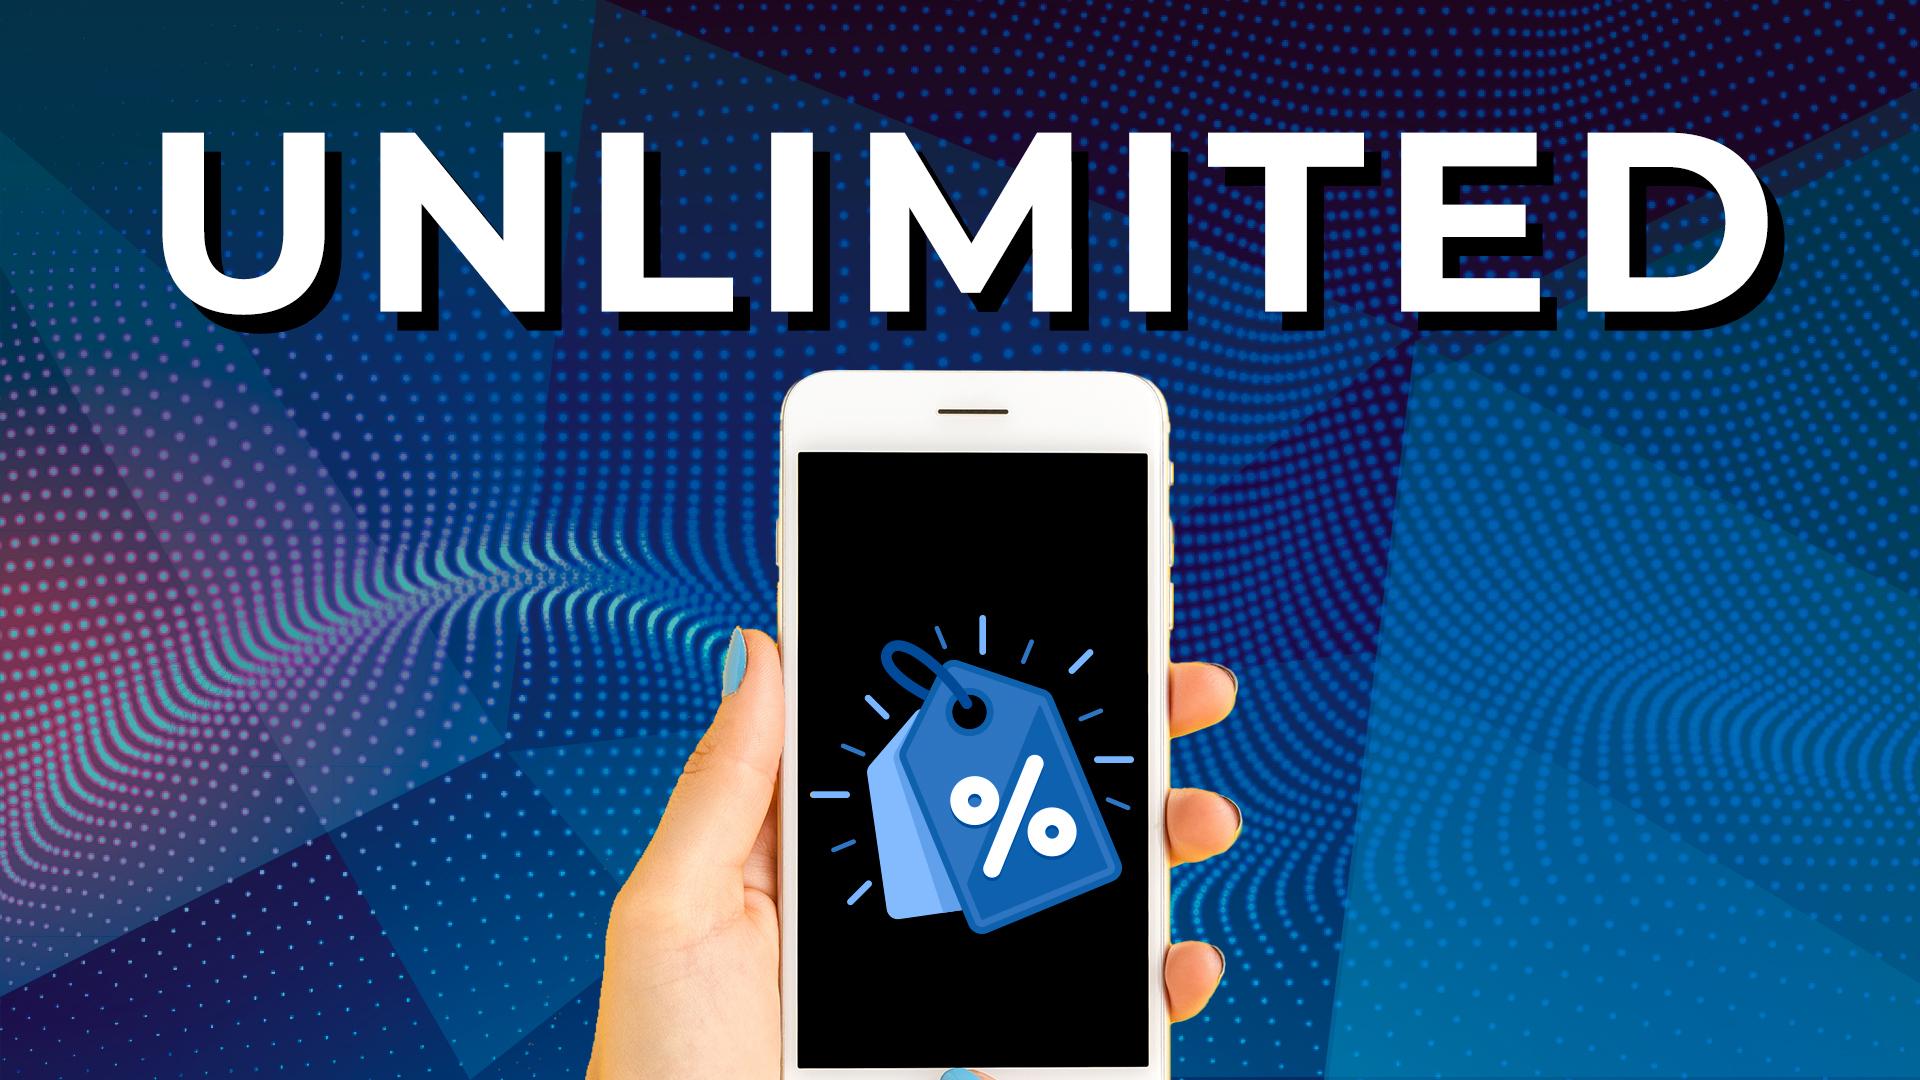 Smartphone, Mobilfunk, Tarif, Angebot, Flatrate, Mobilfunkanbieter, Telekommunikationsunternehmen, Mobilfunktarif, Mobilfunkvertrag, Unlimited, prozente, Handyvertrag, Unlimited Flat, DayFlat unlimited, unlimitiert